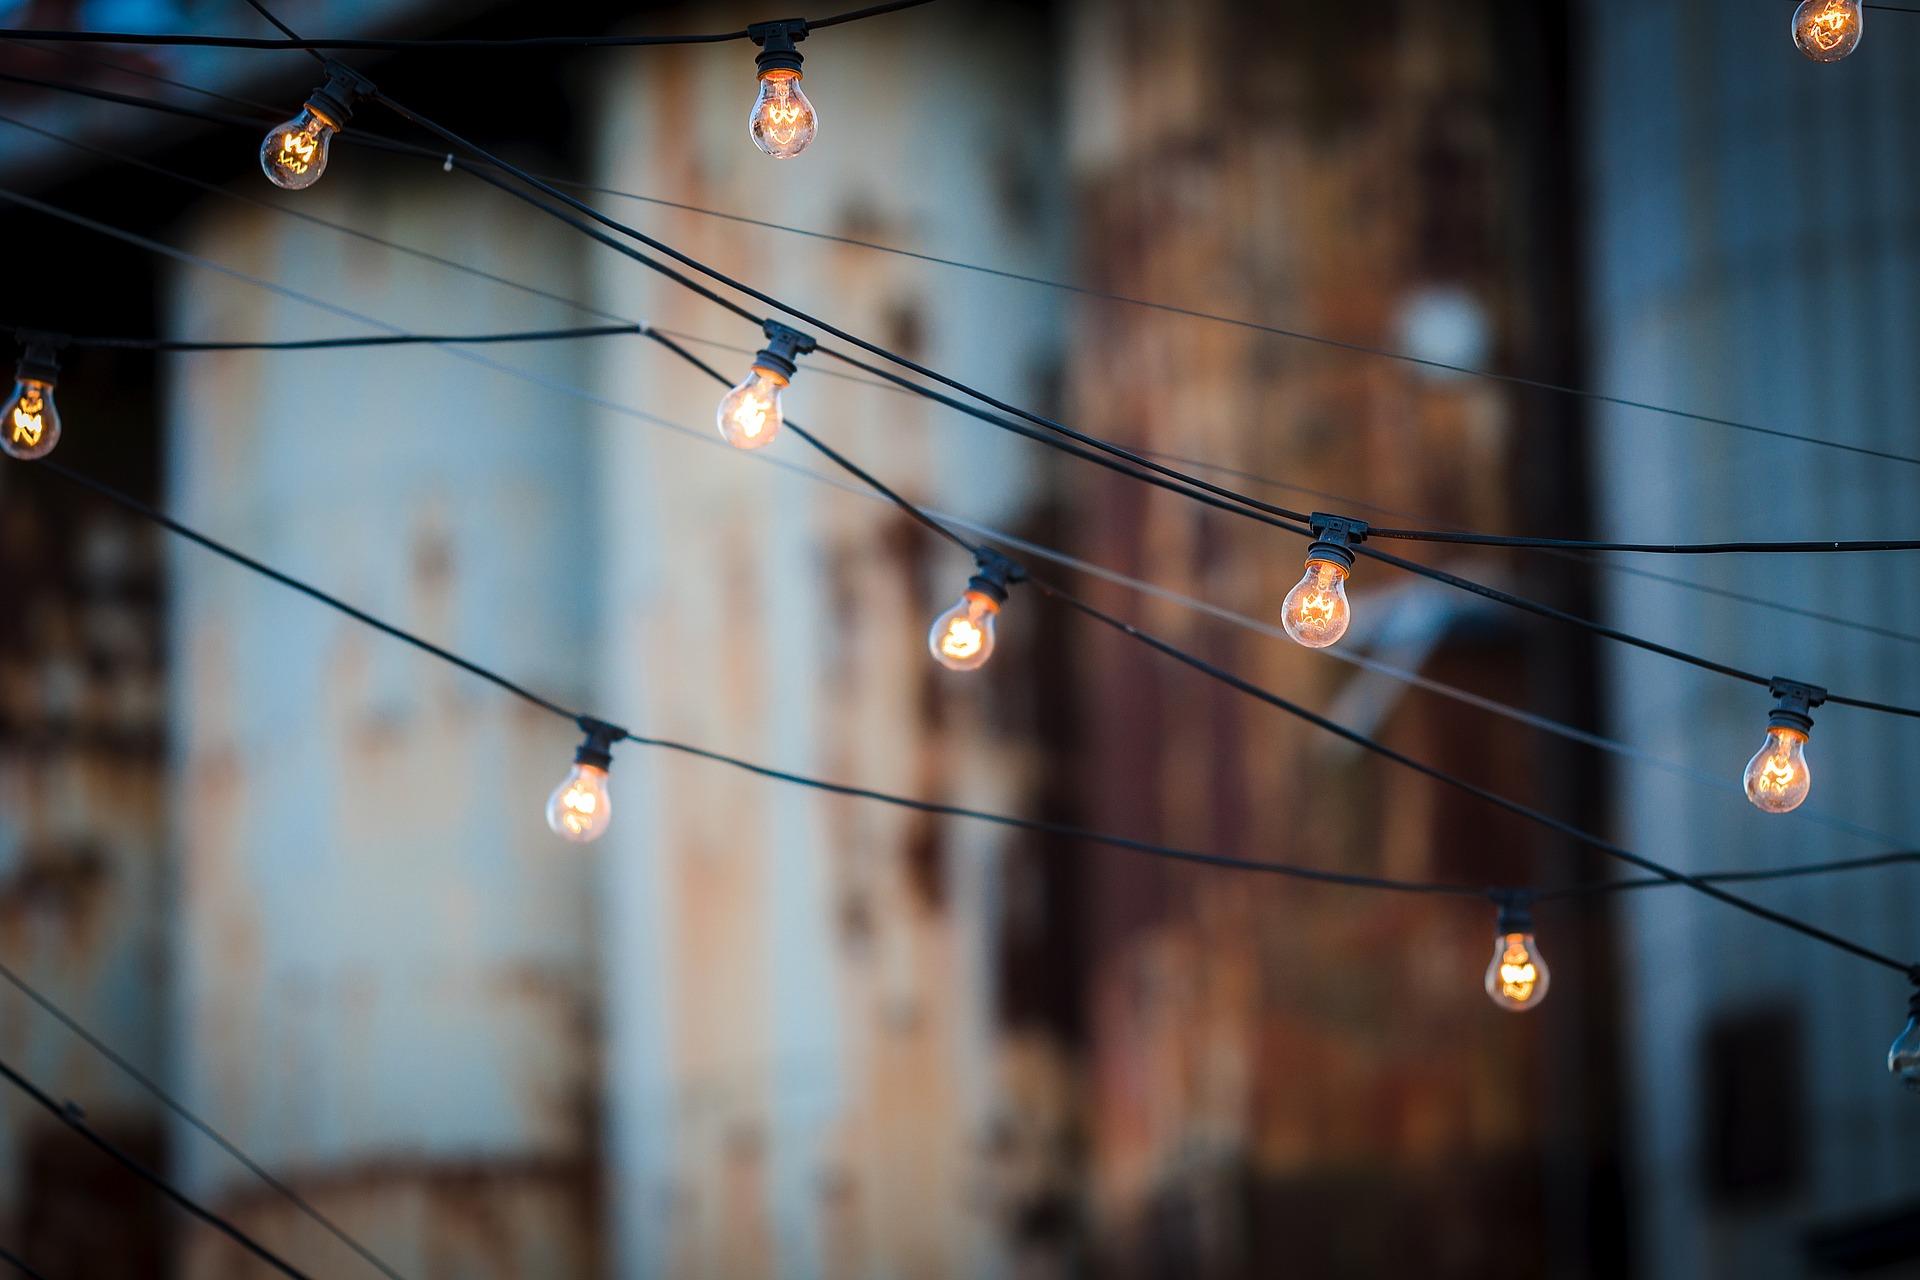 light-bulbs-1875268_1920.jpg